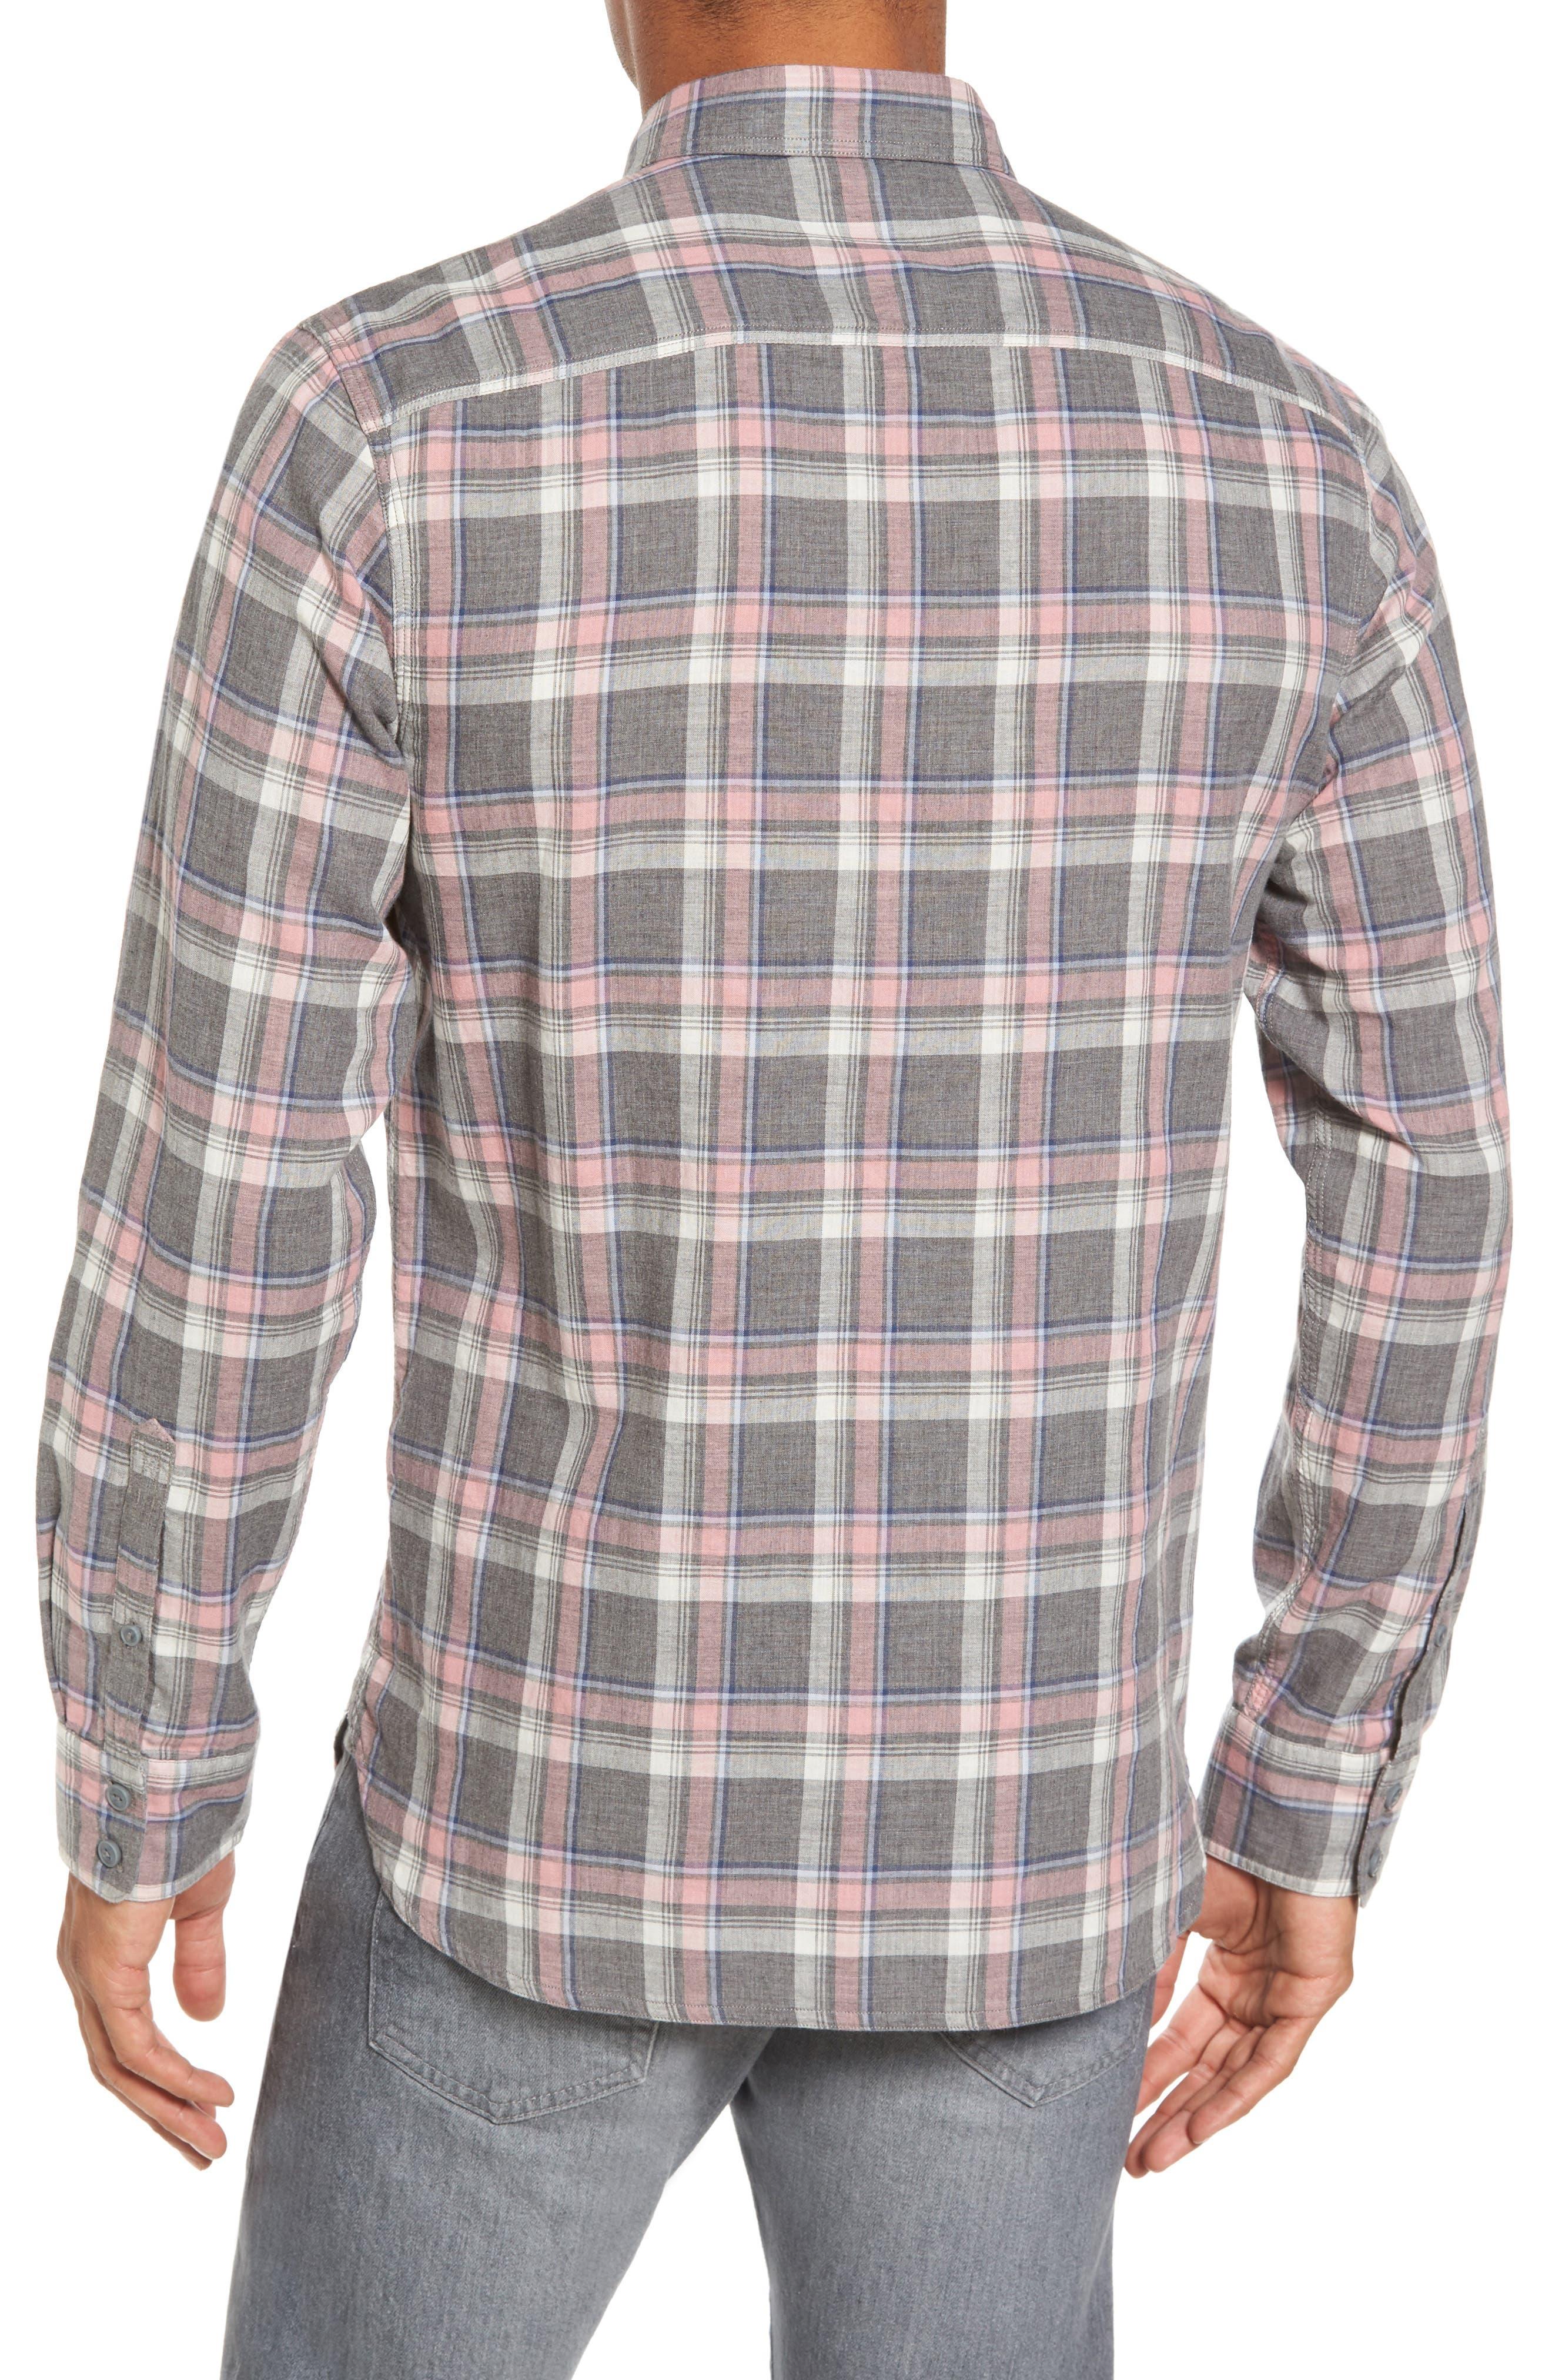 Trim Fit Utility Duofold Sport Shirt,                             Alternate thumbnail 2, color,                             Grey Paloma Pink Plaid Duofold